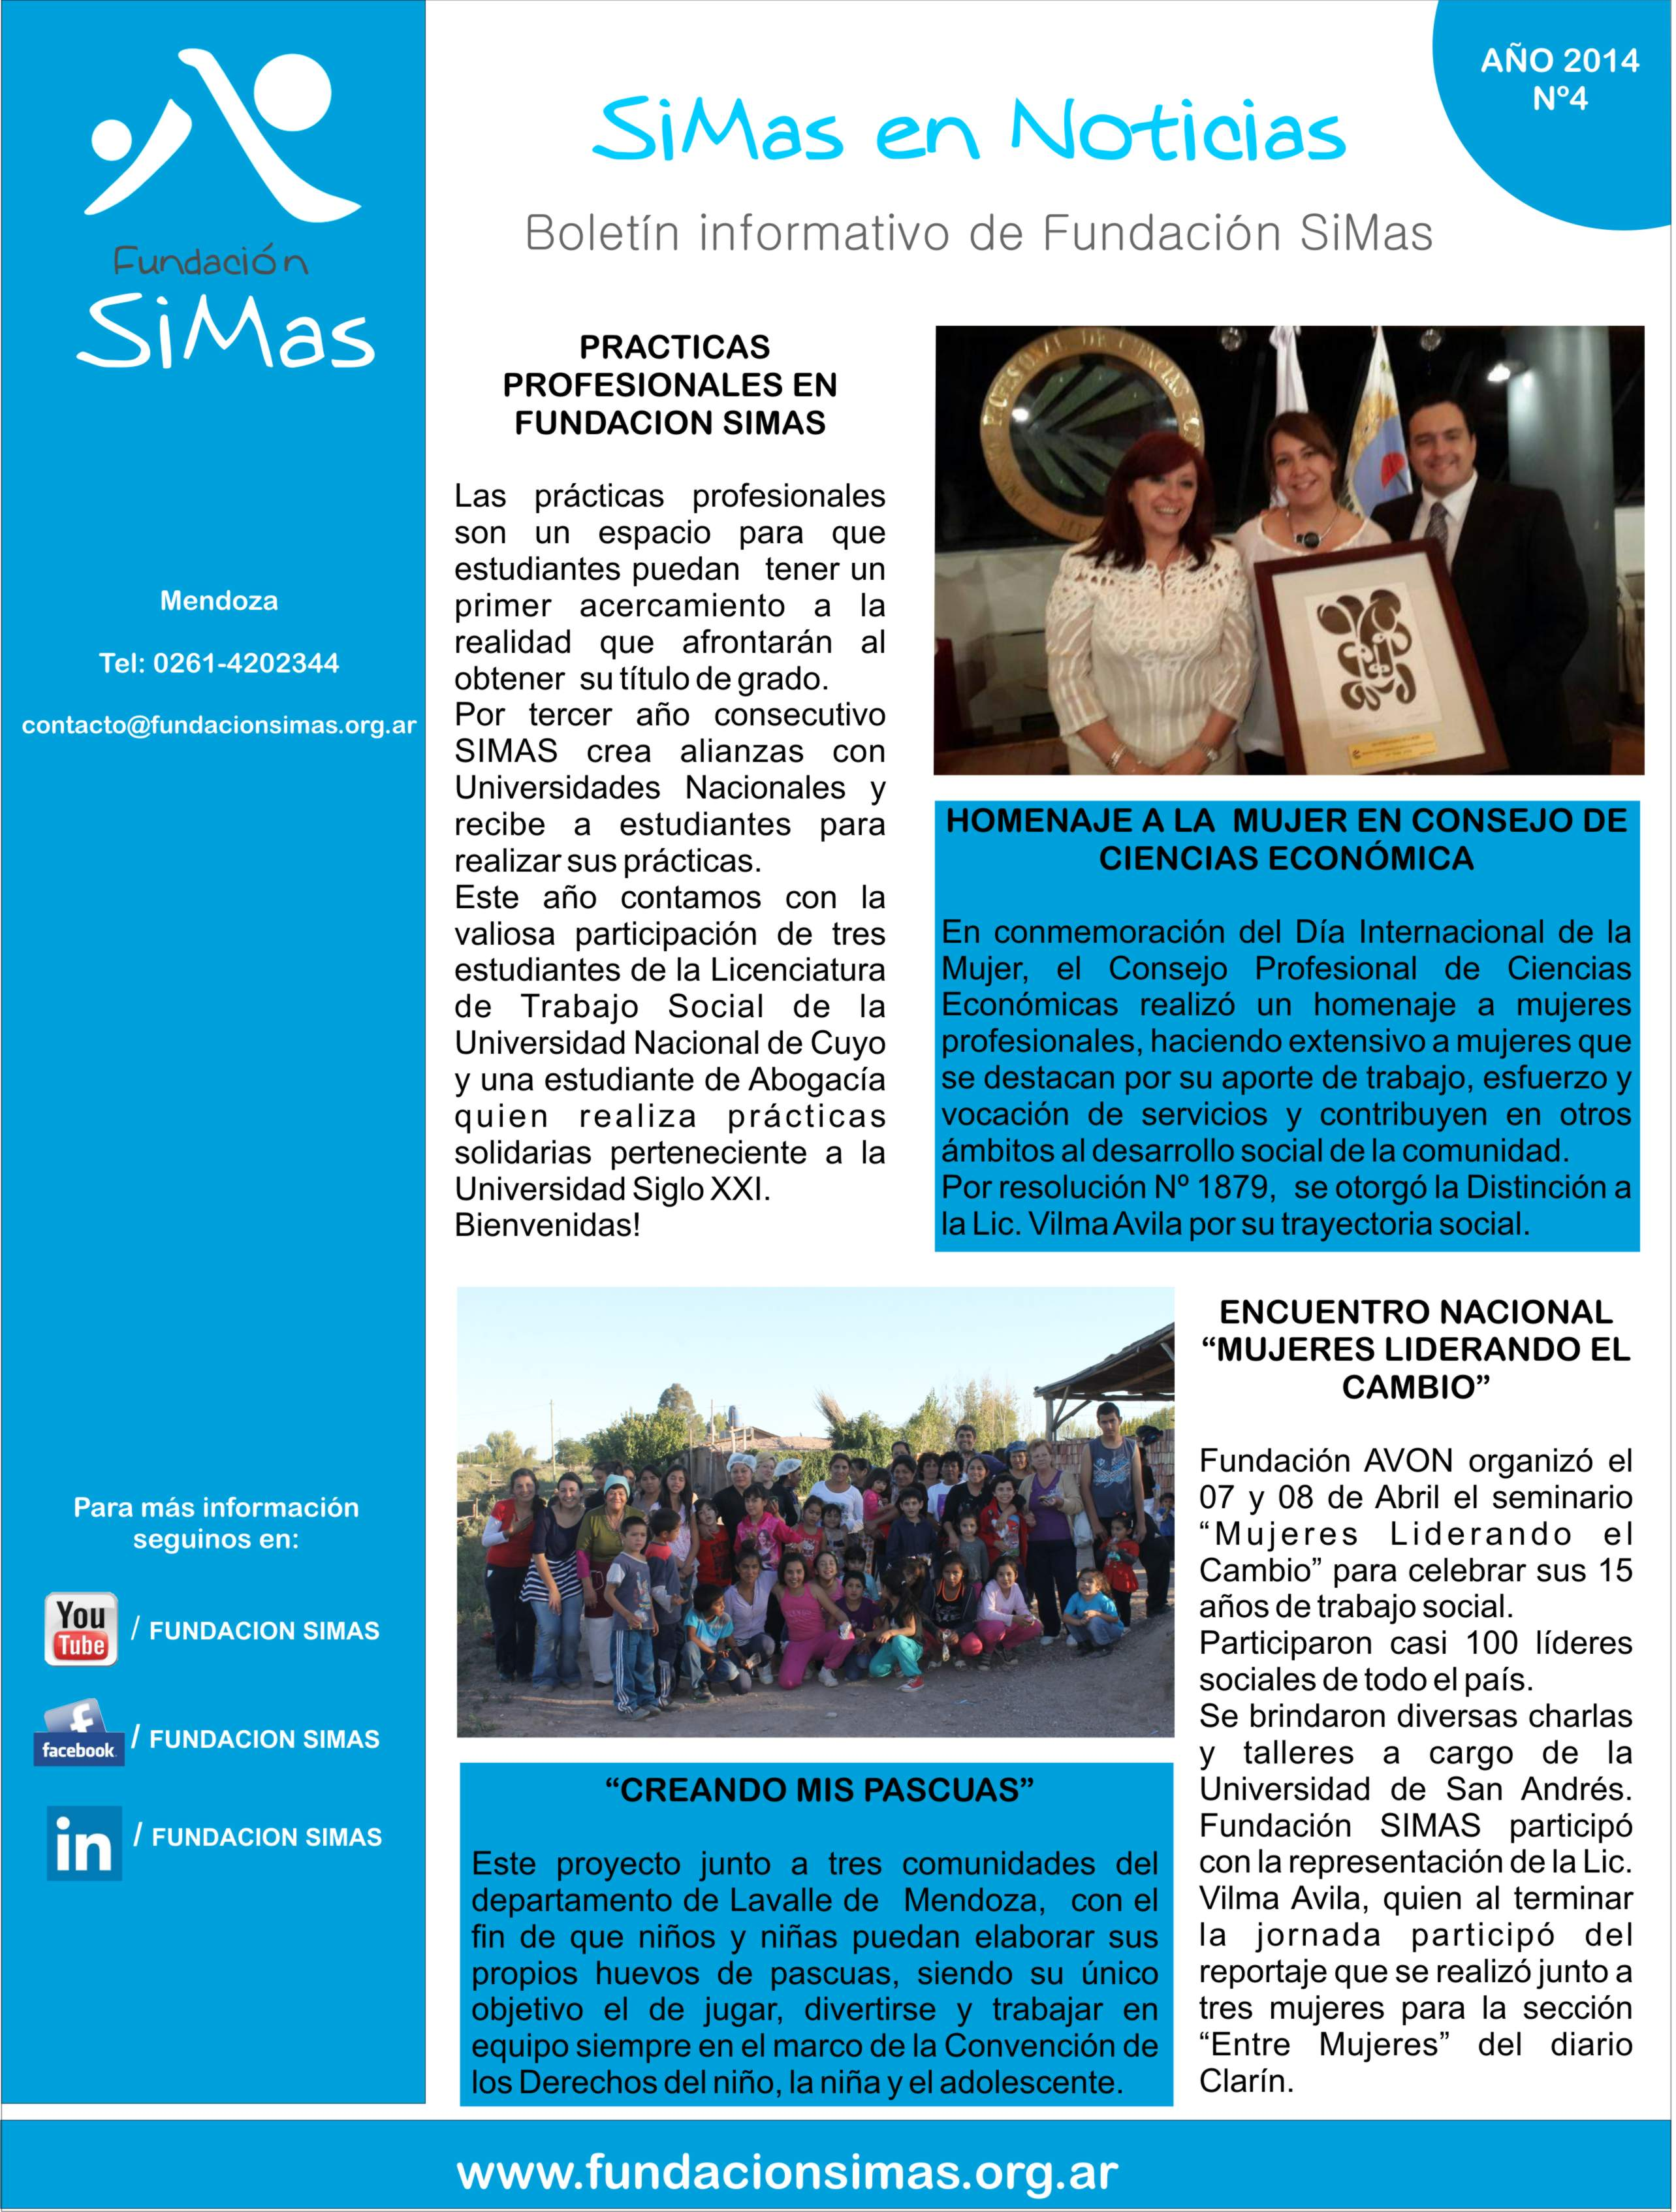 newsletter nº4 - Fundaciòn SIMAS